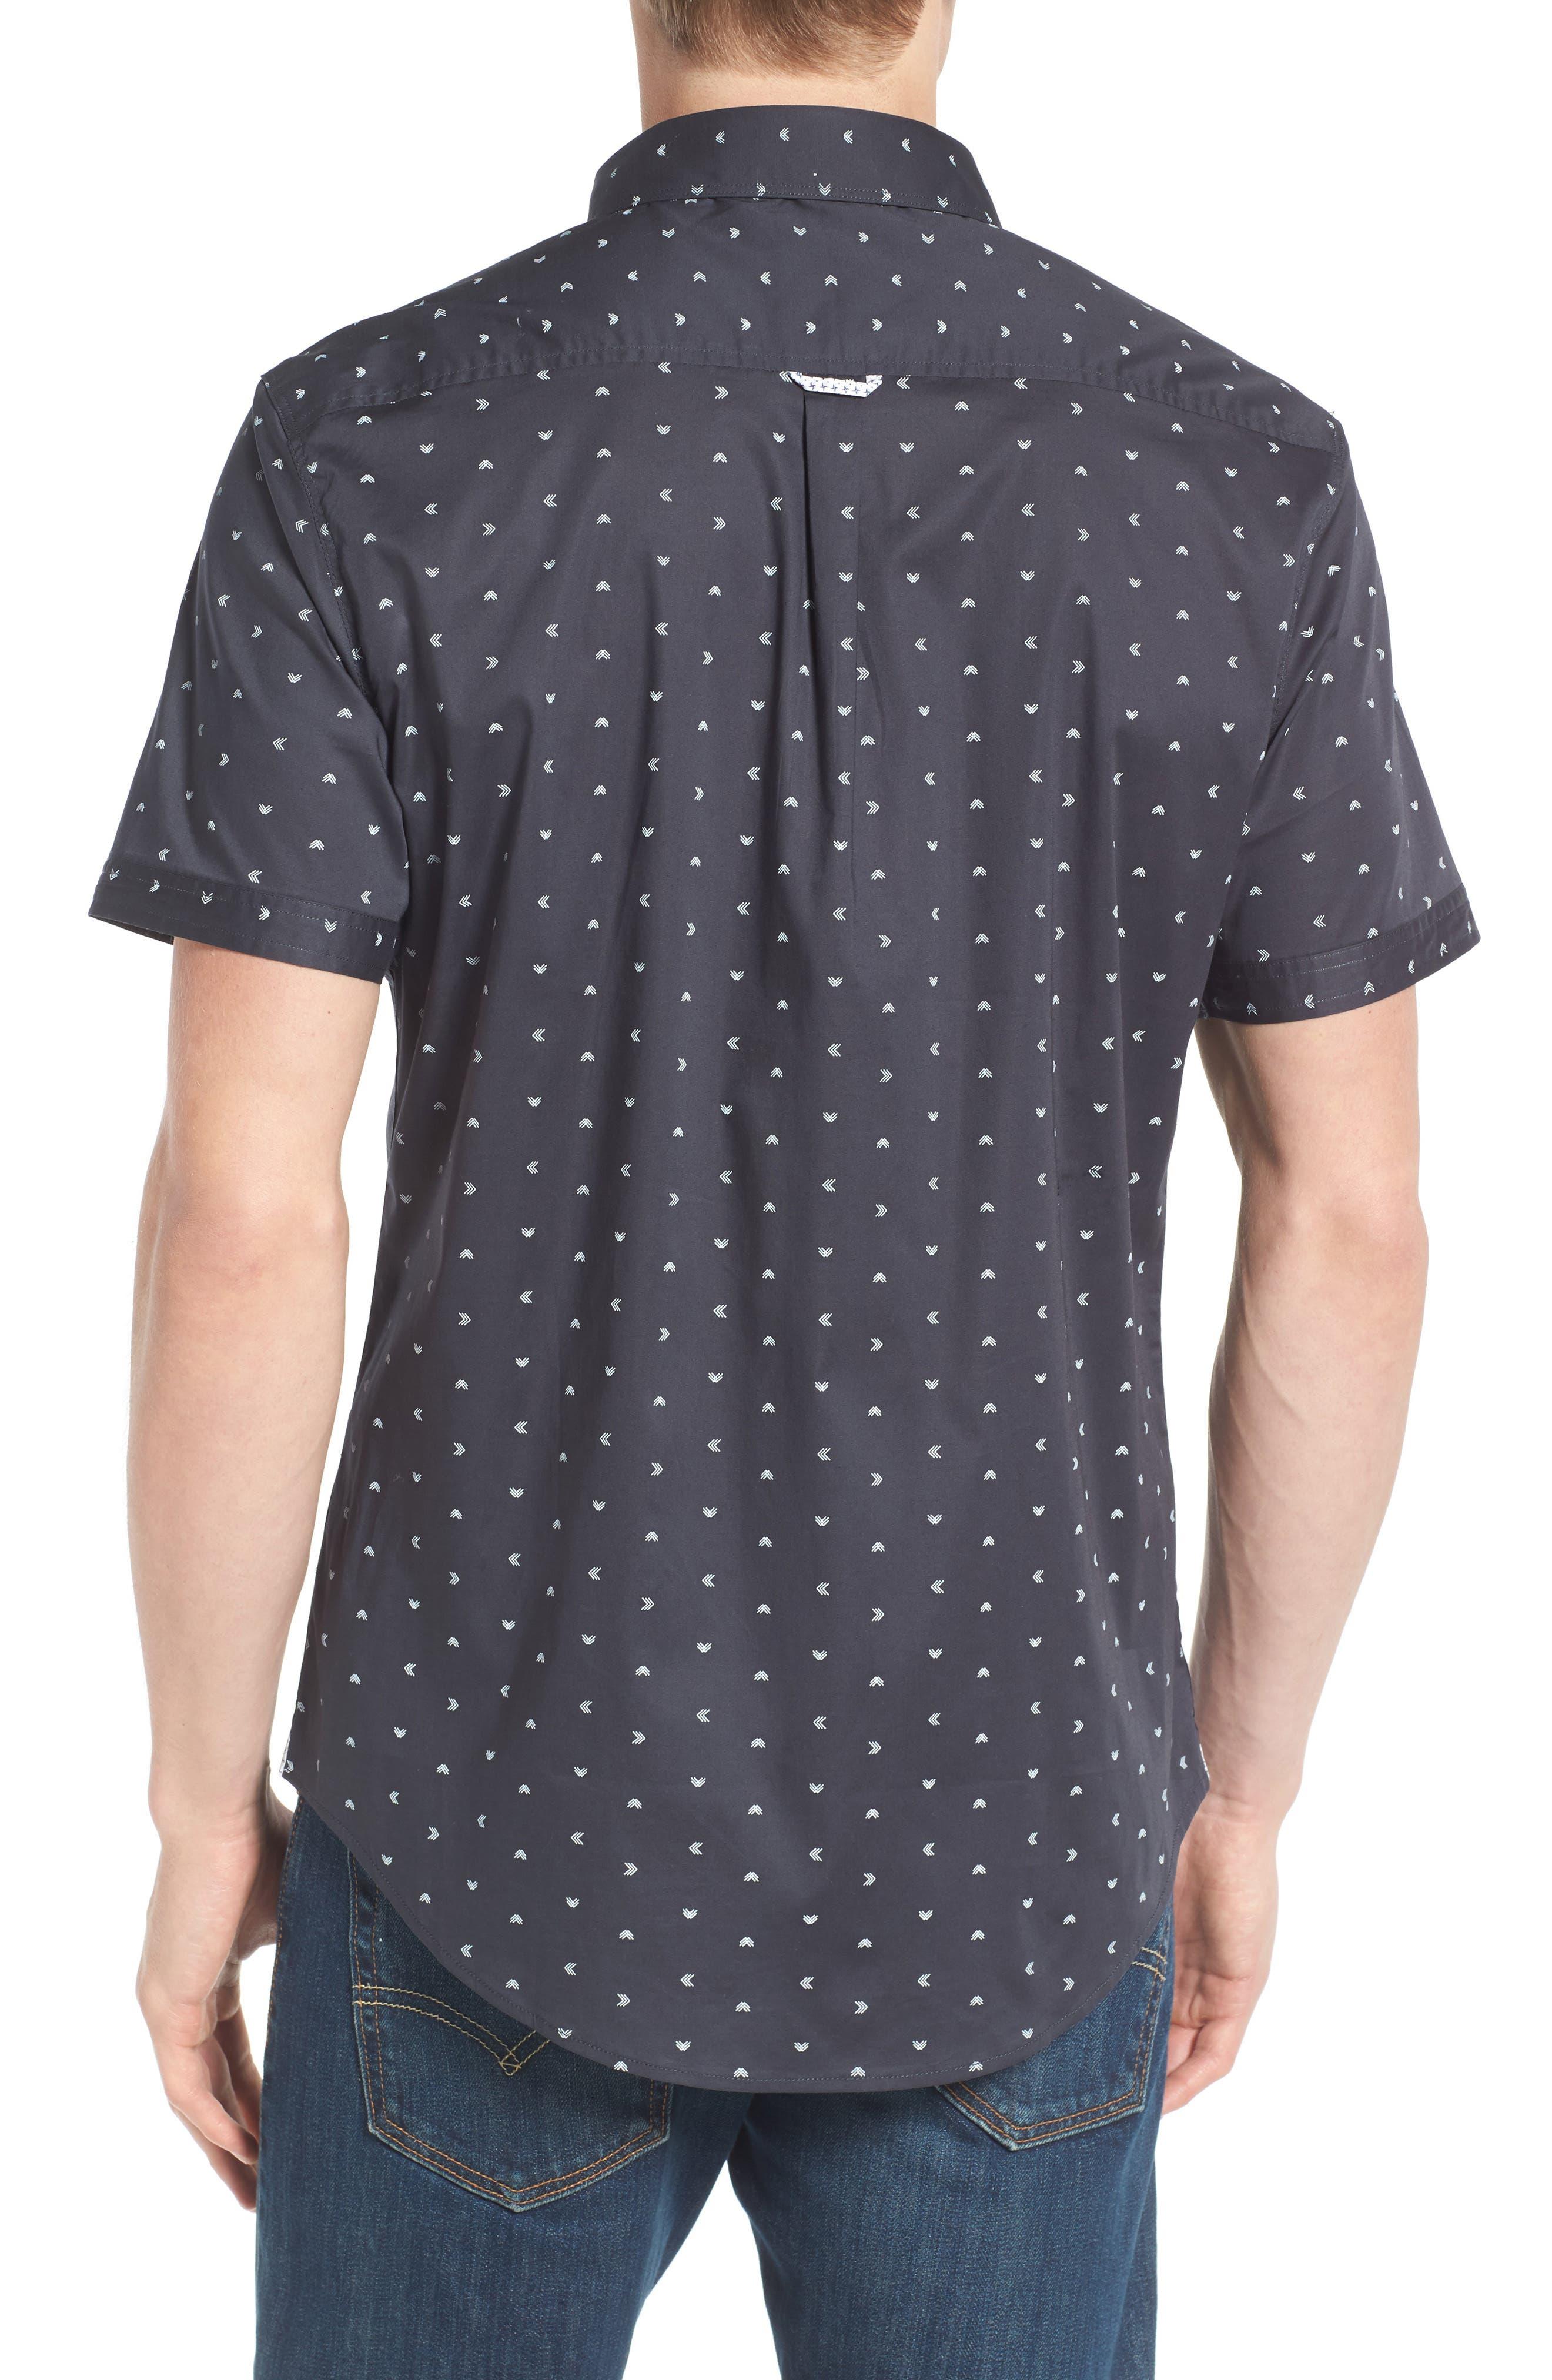 Rising Water Print Woven Shirt,                             Alternate thumbnail 2, color,                             Charcoal